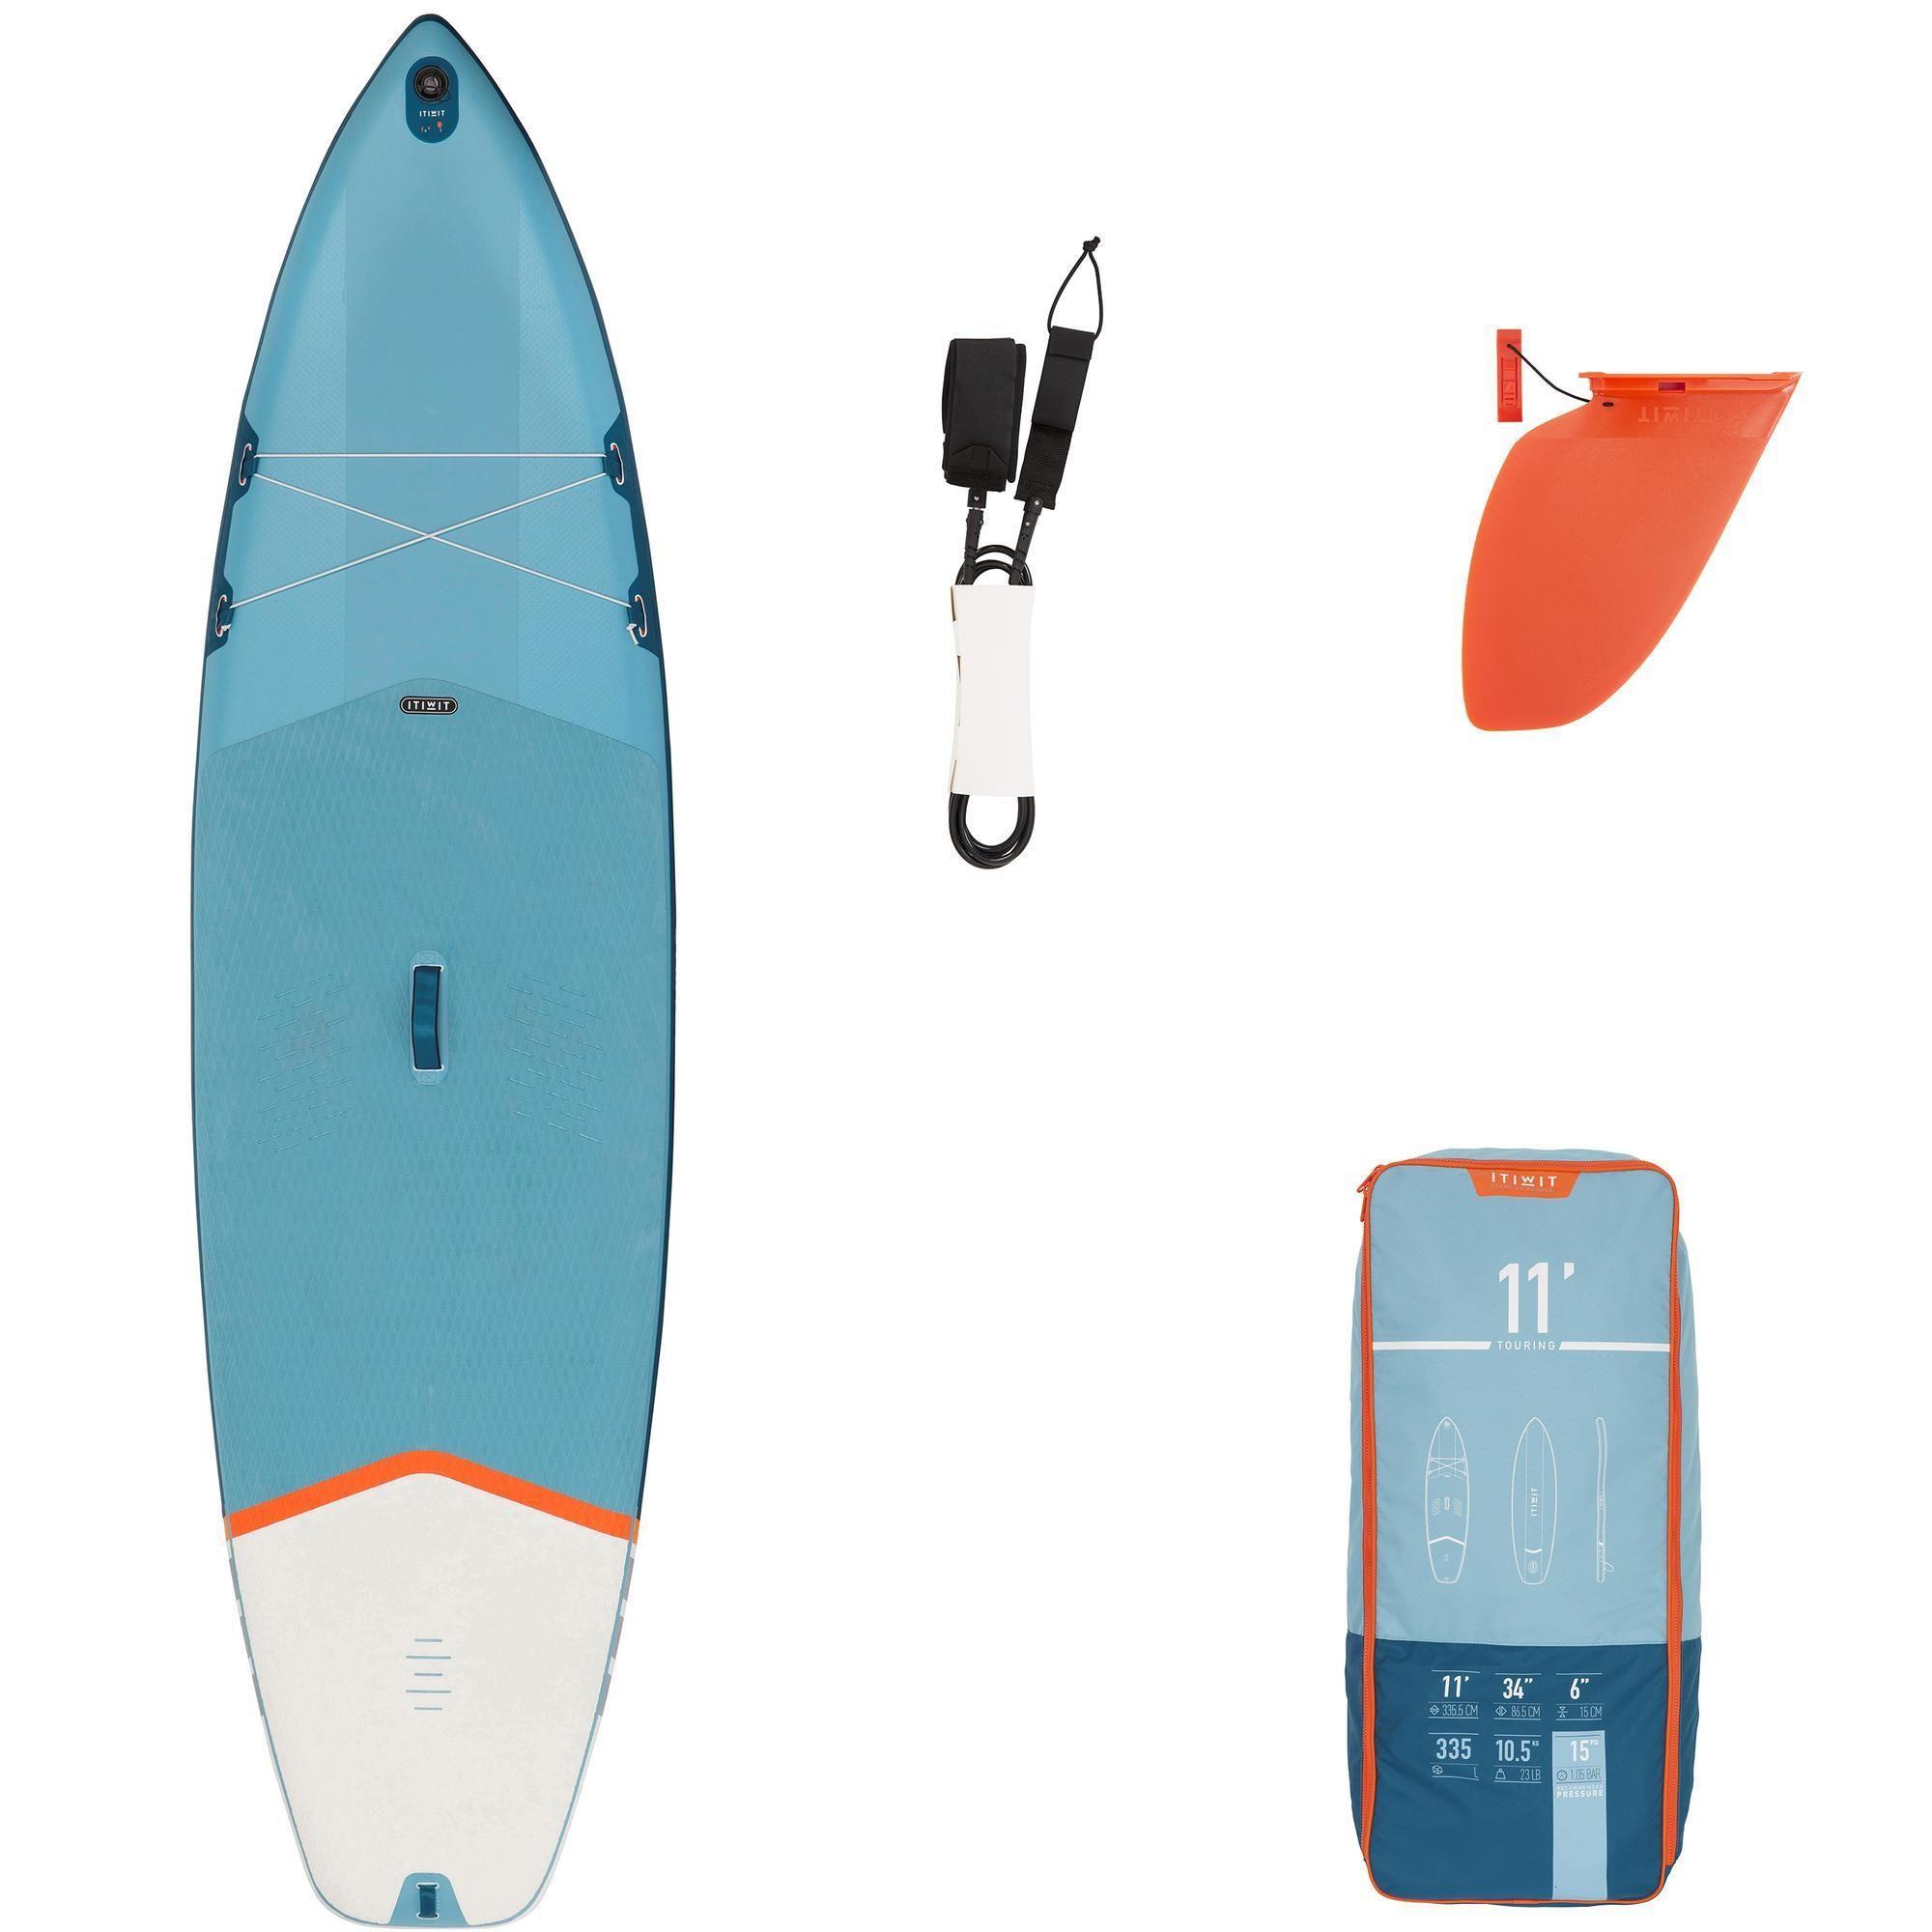 Salitos Stand Up Paddle Surf Board Inflatable Aufblasbar Inkl Pumpe Zubehor Ebay